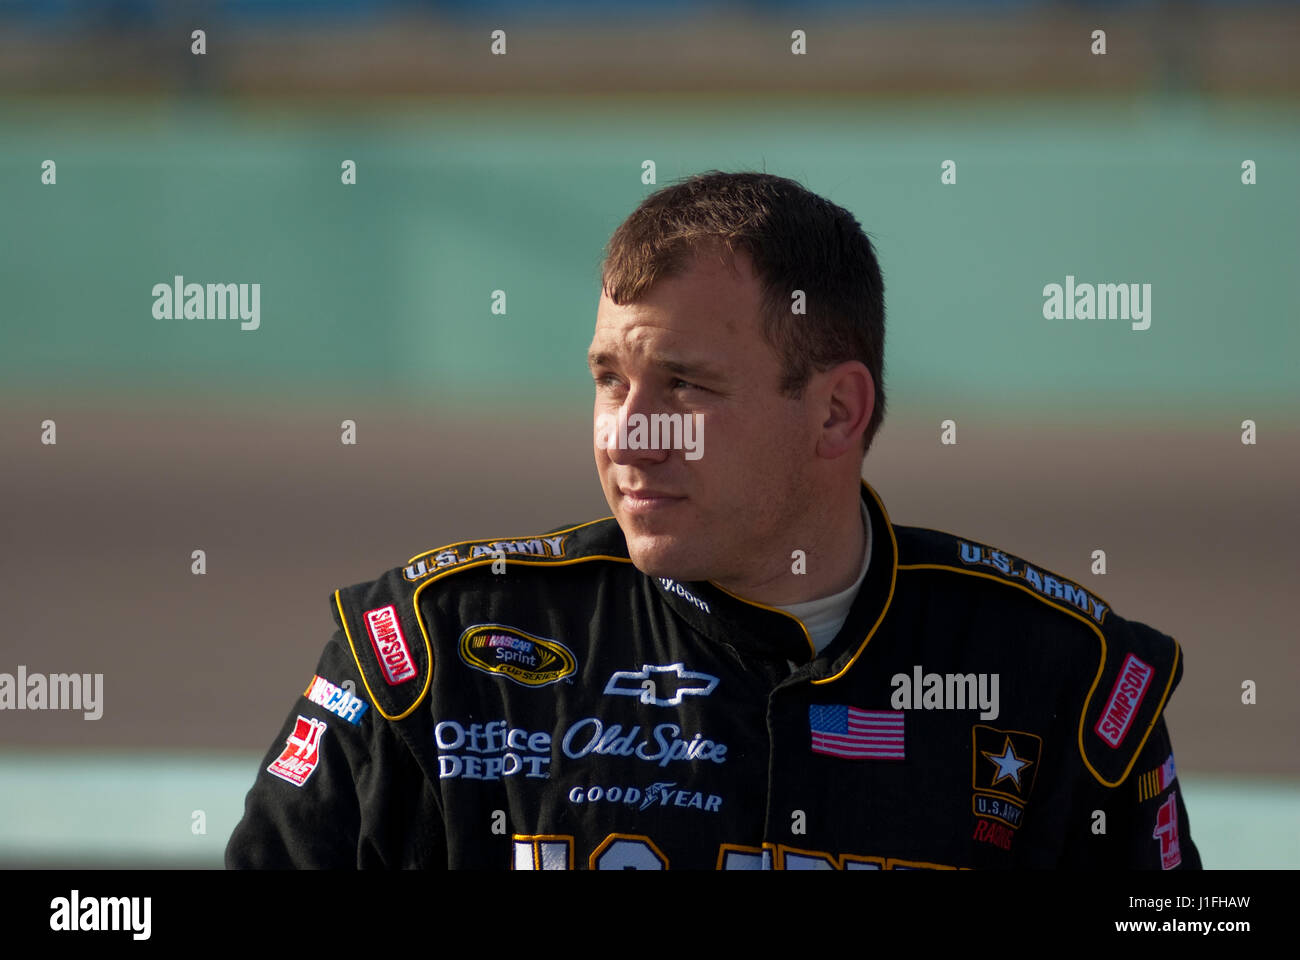 NASCAR Racing Motorsport Stockbild